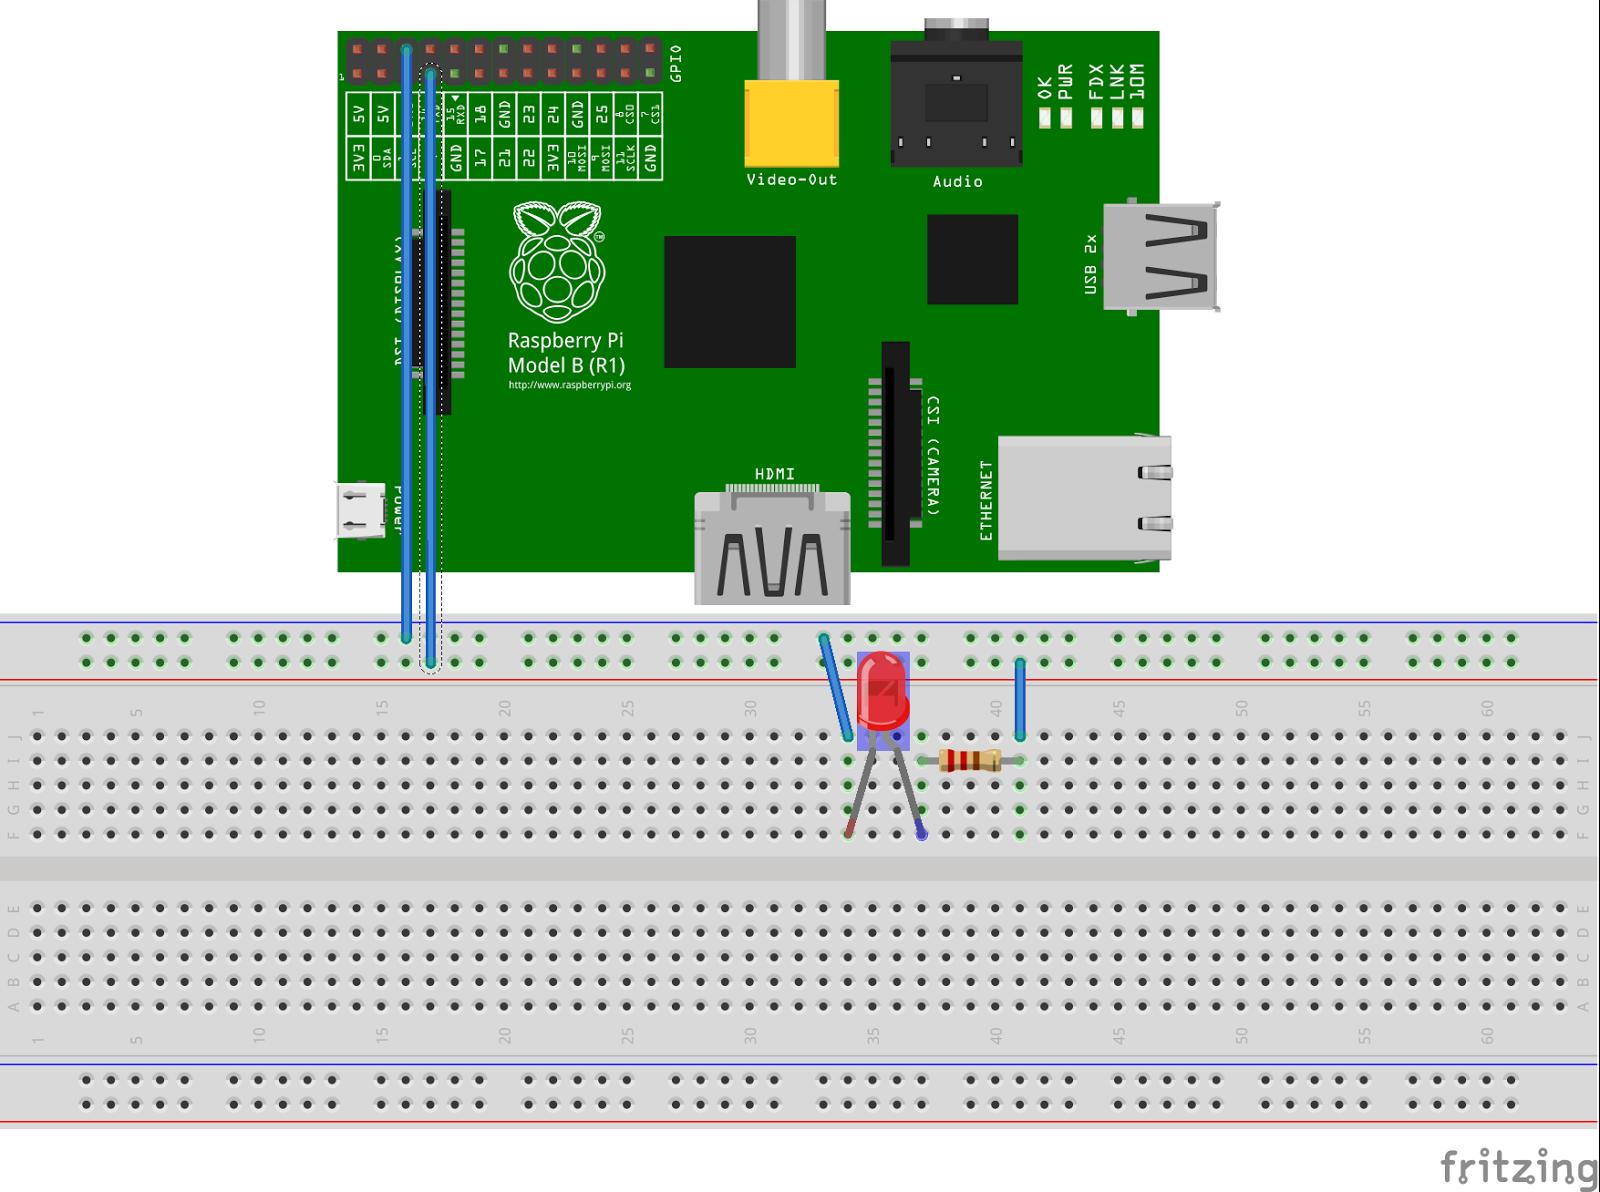 MQTT Communication with Arduino using ESP8266